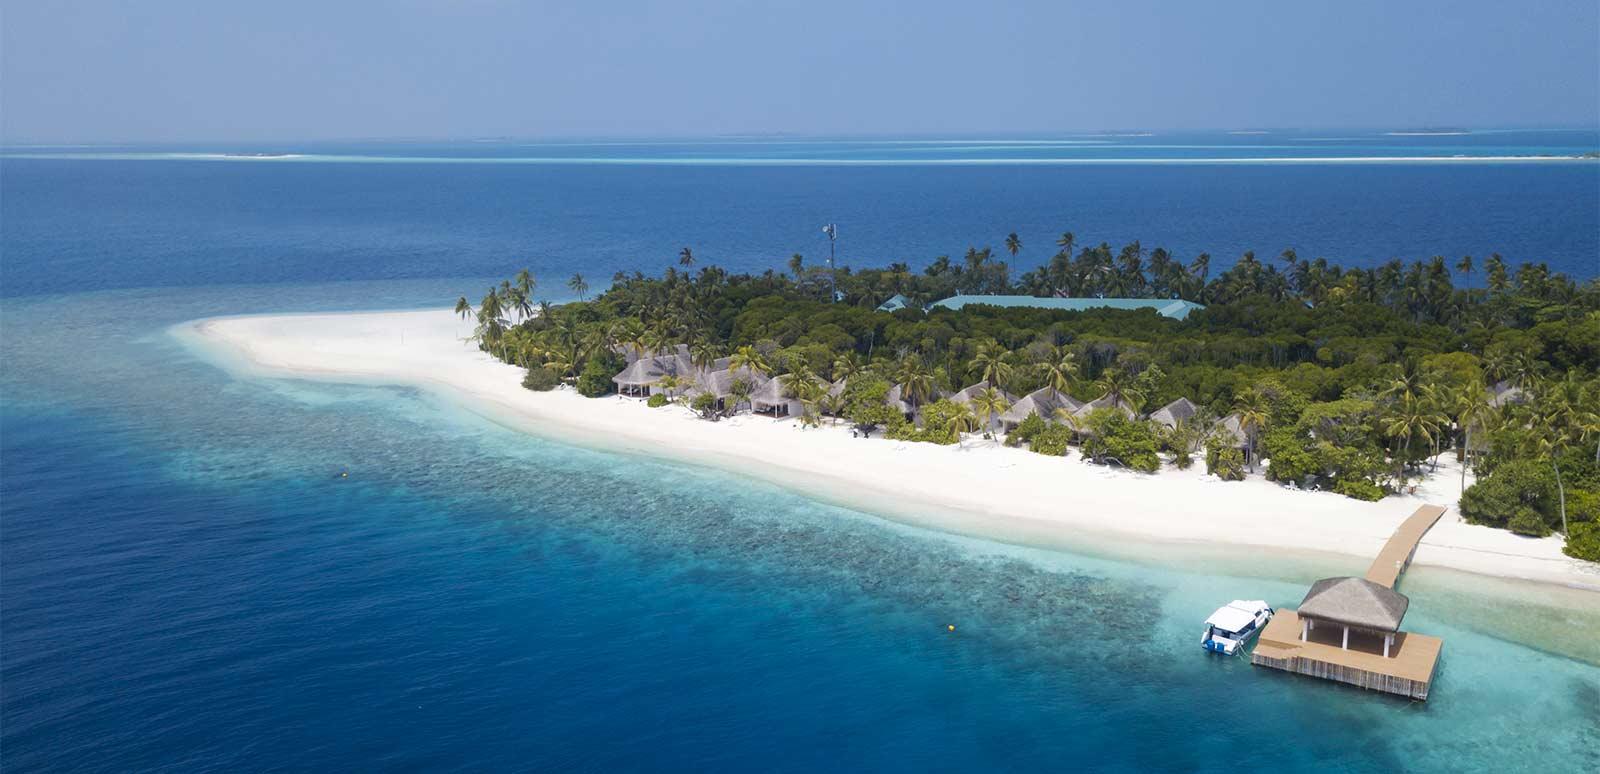 viajes a Dreamland Maldives 8 noches